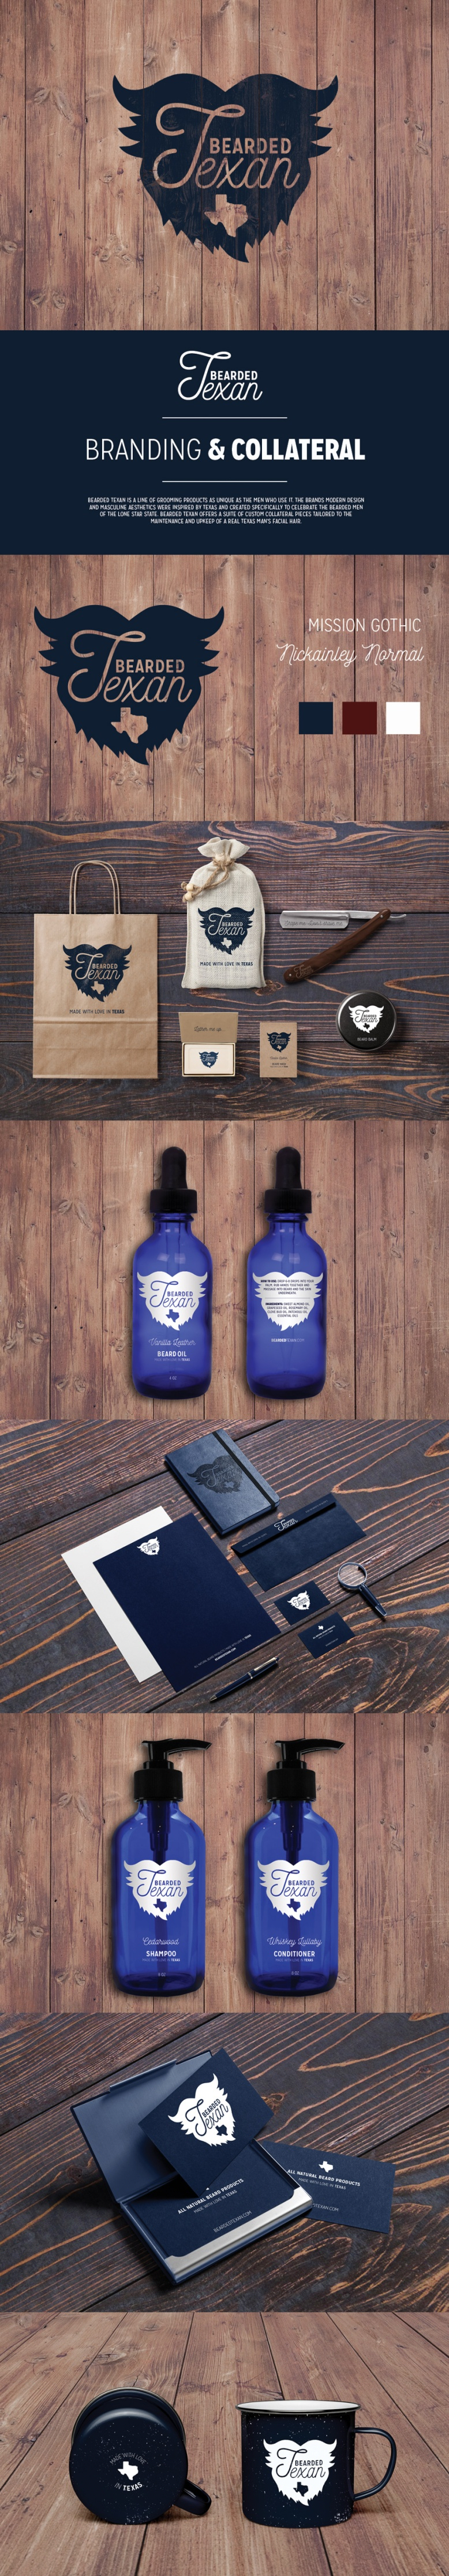 BeardOil-01-layoutforweb